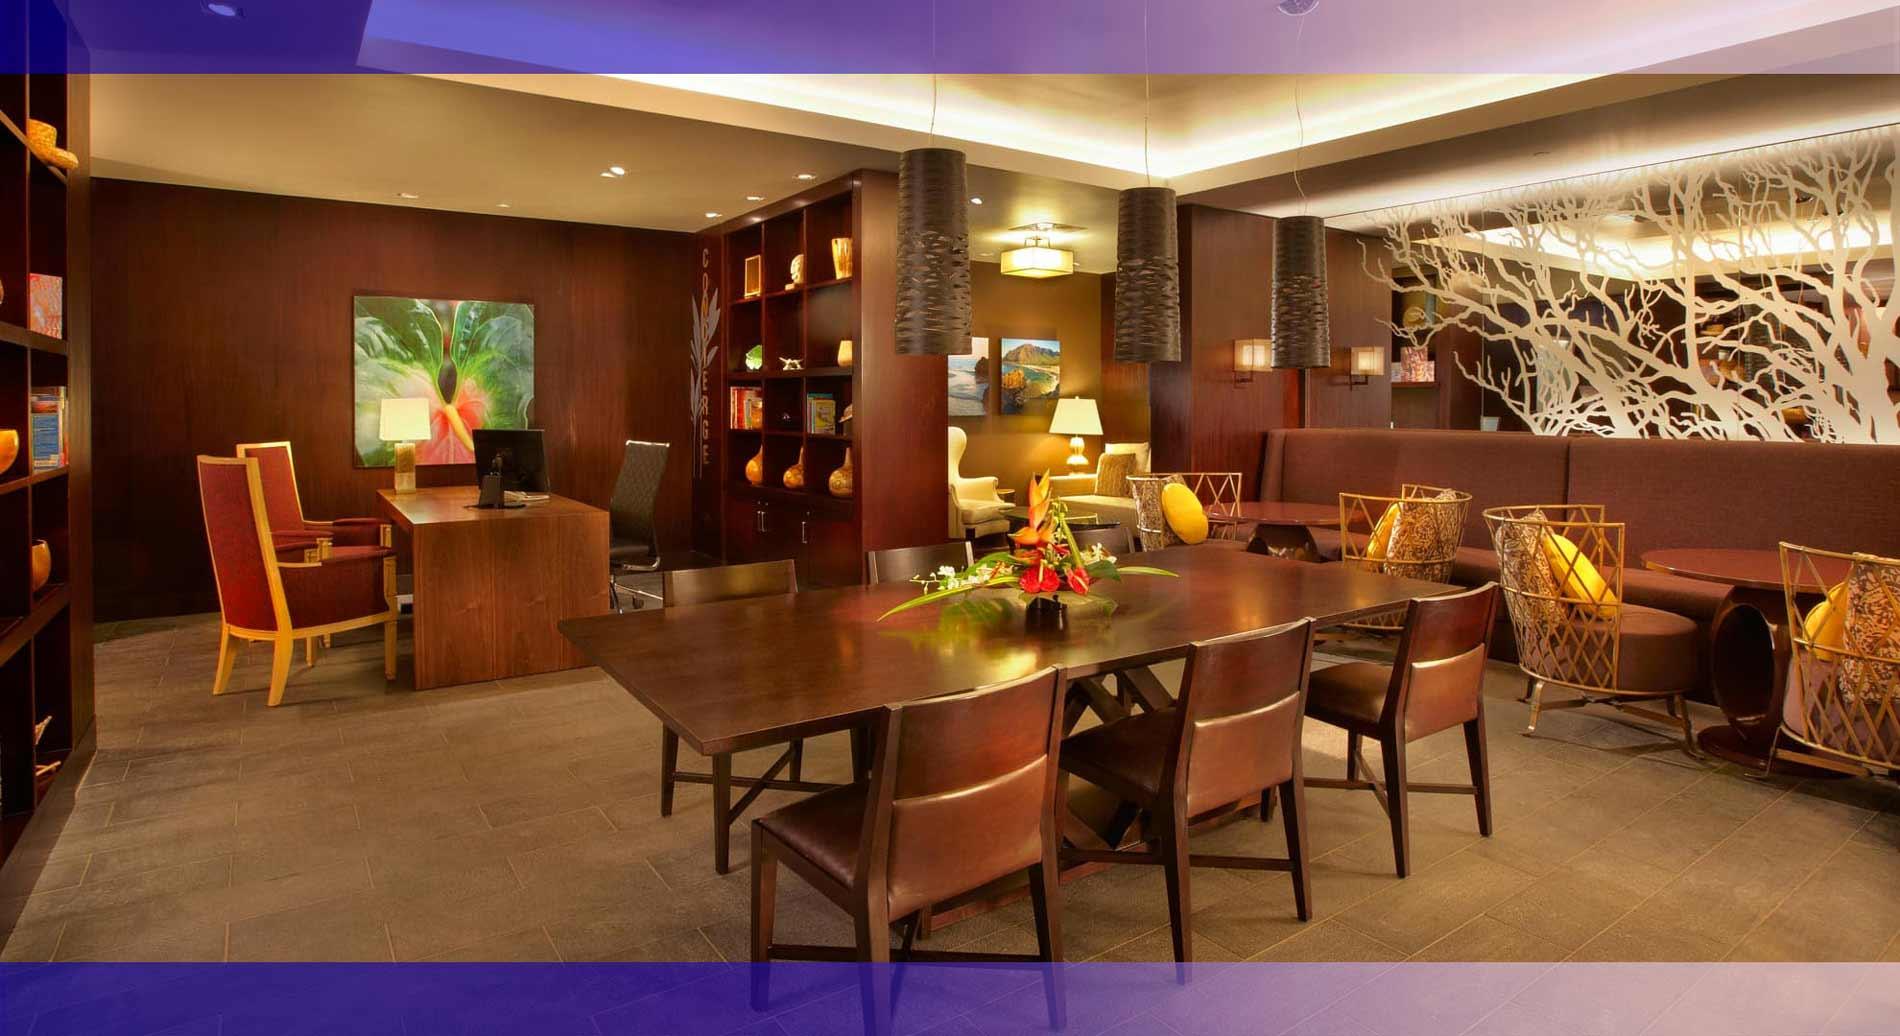 tarahi dakheli hotel 007p - طراحی داخلی هتل